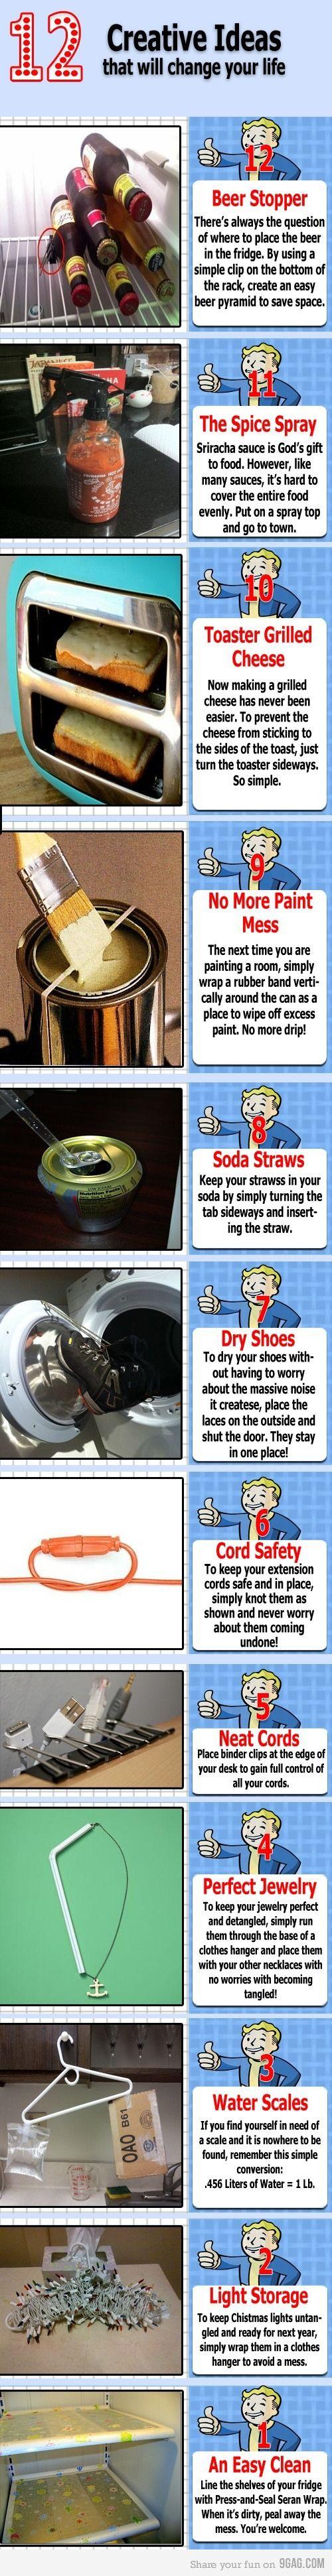 Amazing ideas!